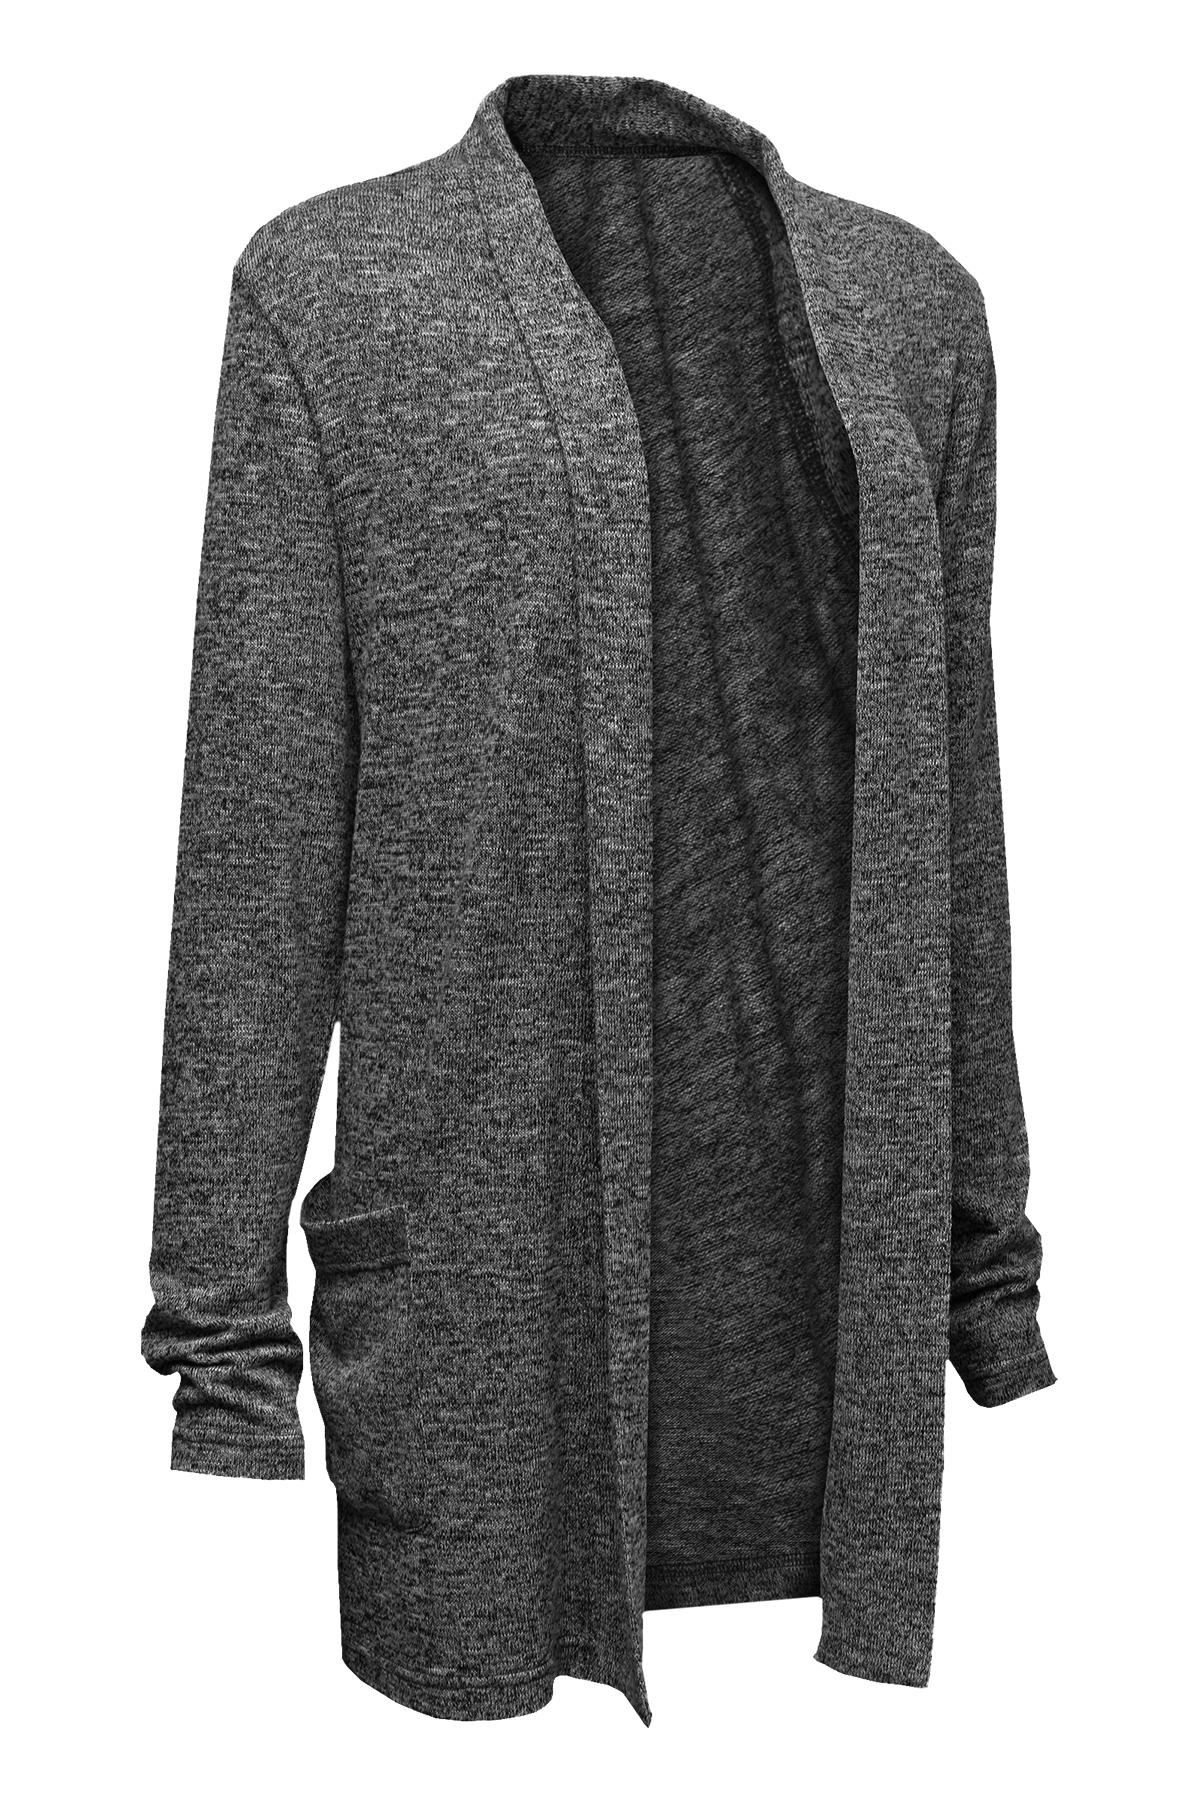 BAW Athletic Wear LC230 - Ladies Easy Fit Cardigan